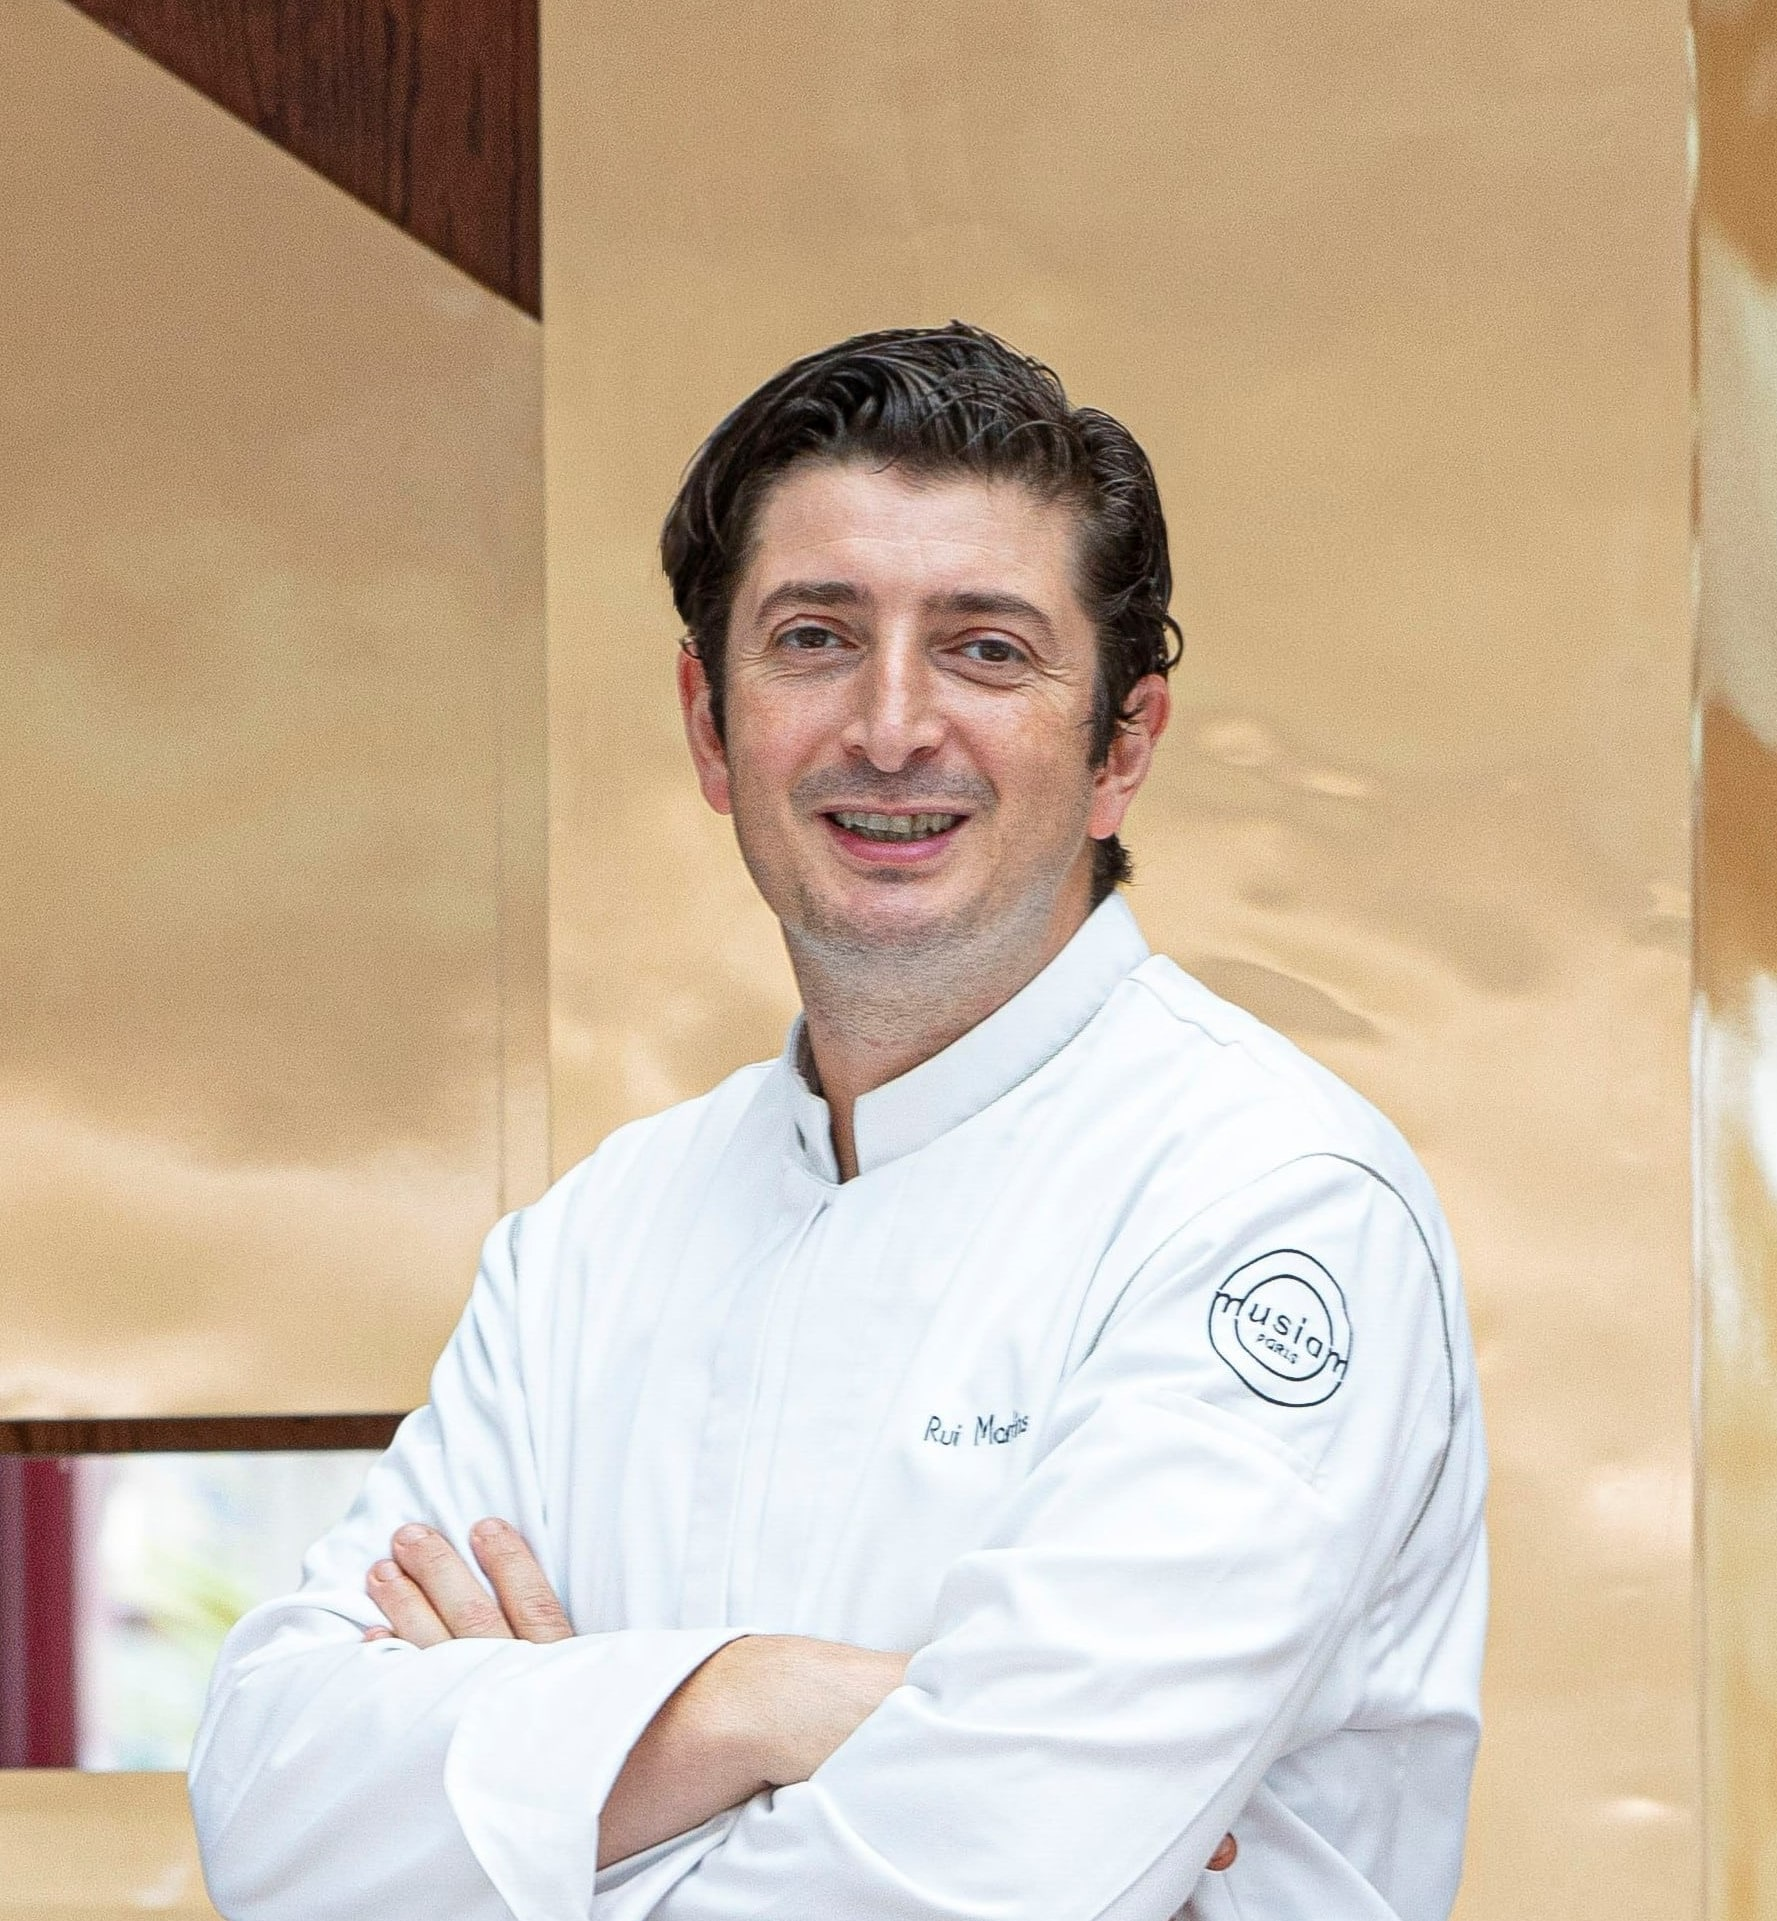 Chef Holder